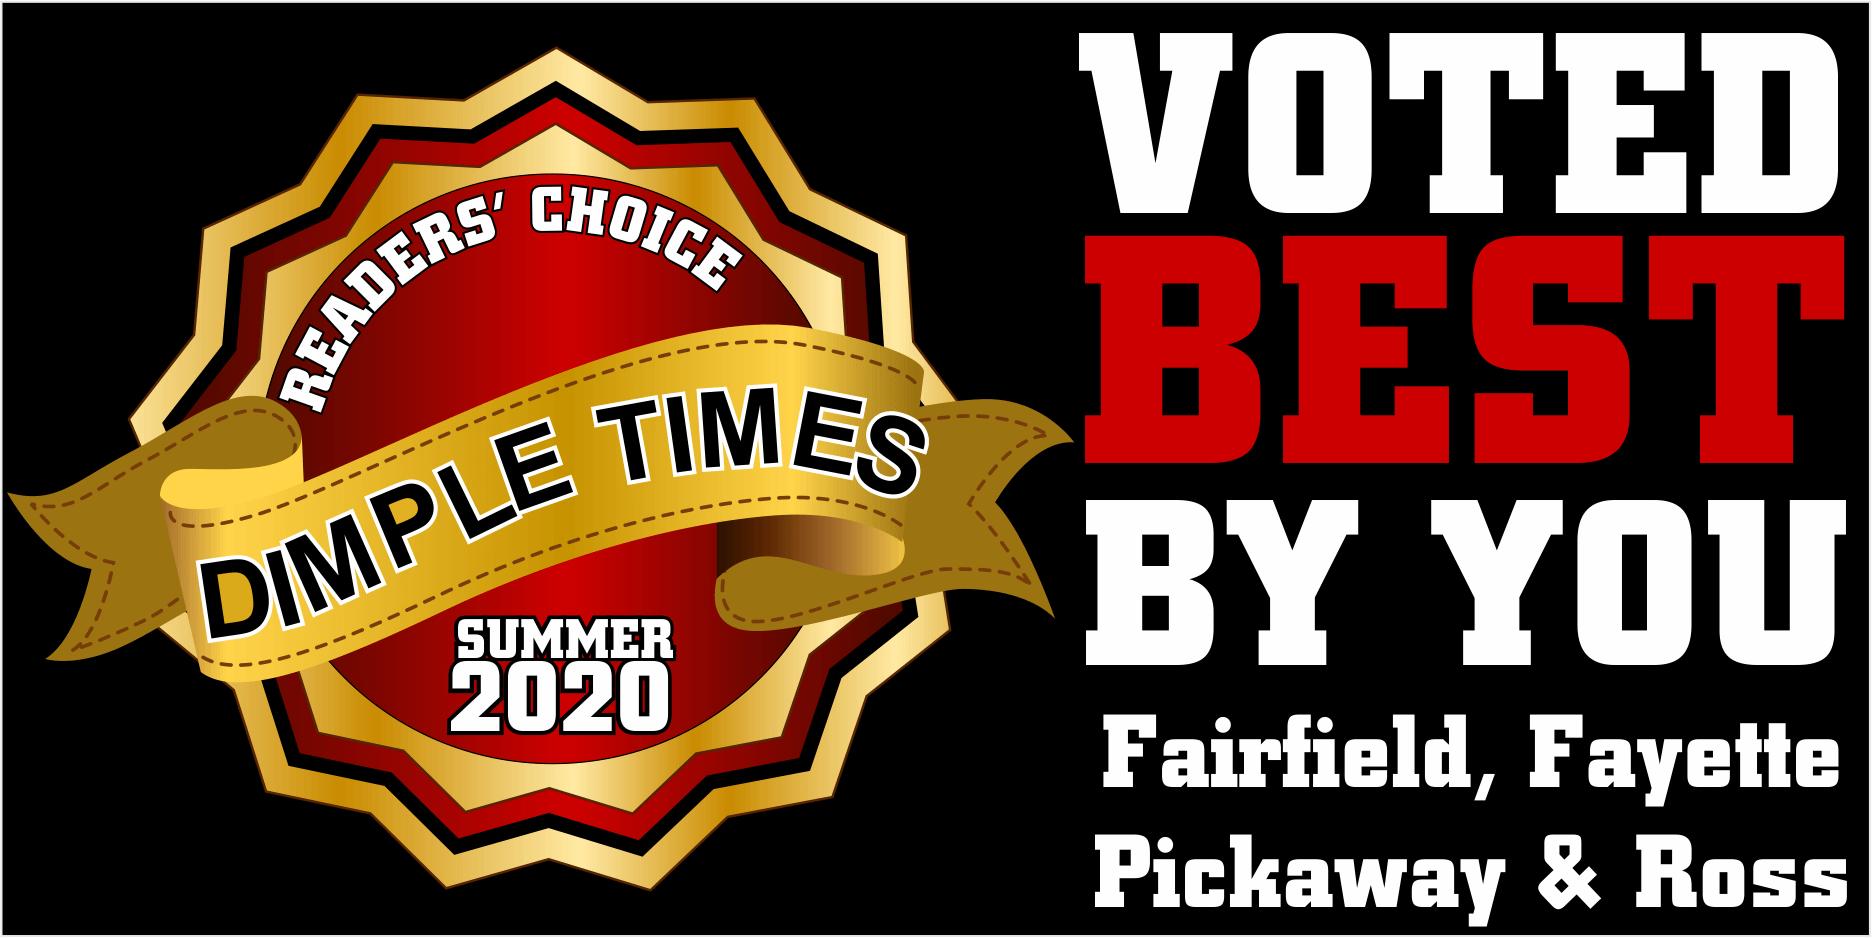 Reader's Choice Summer 2020